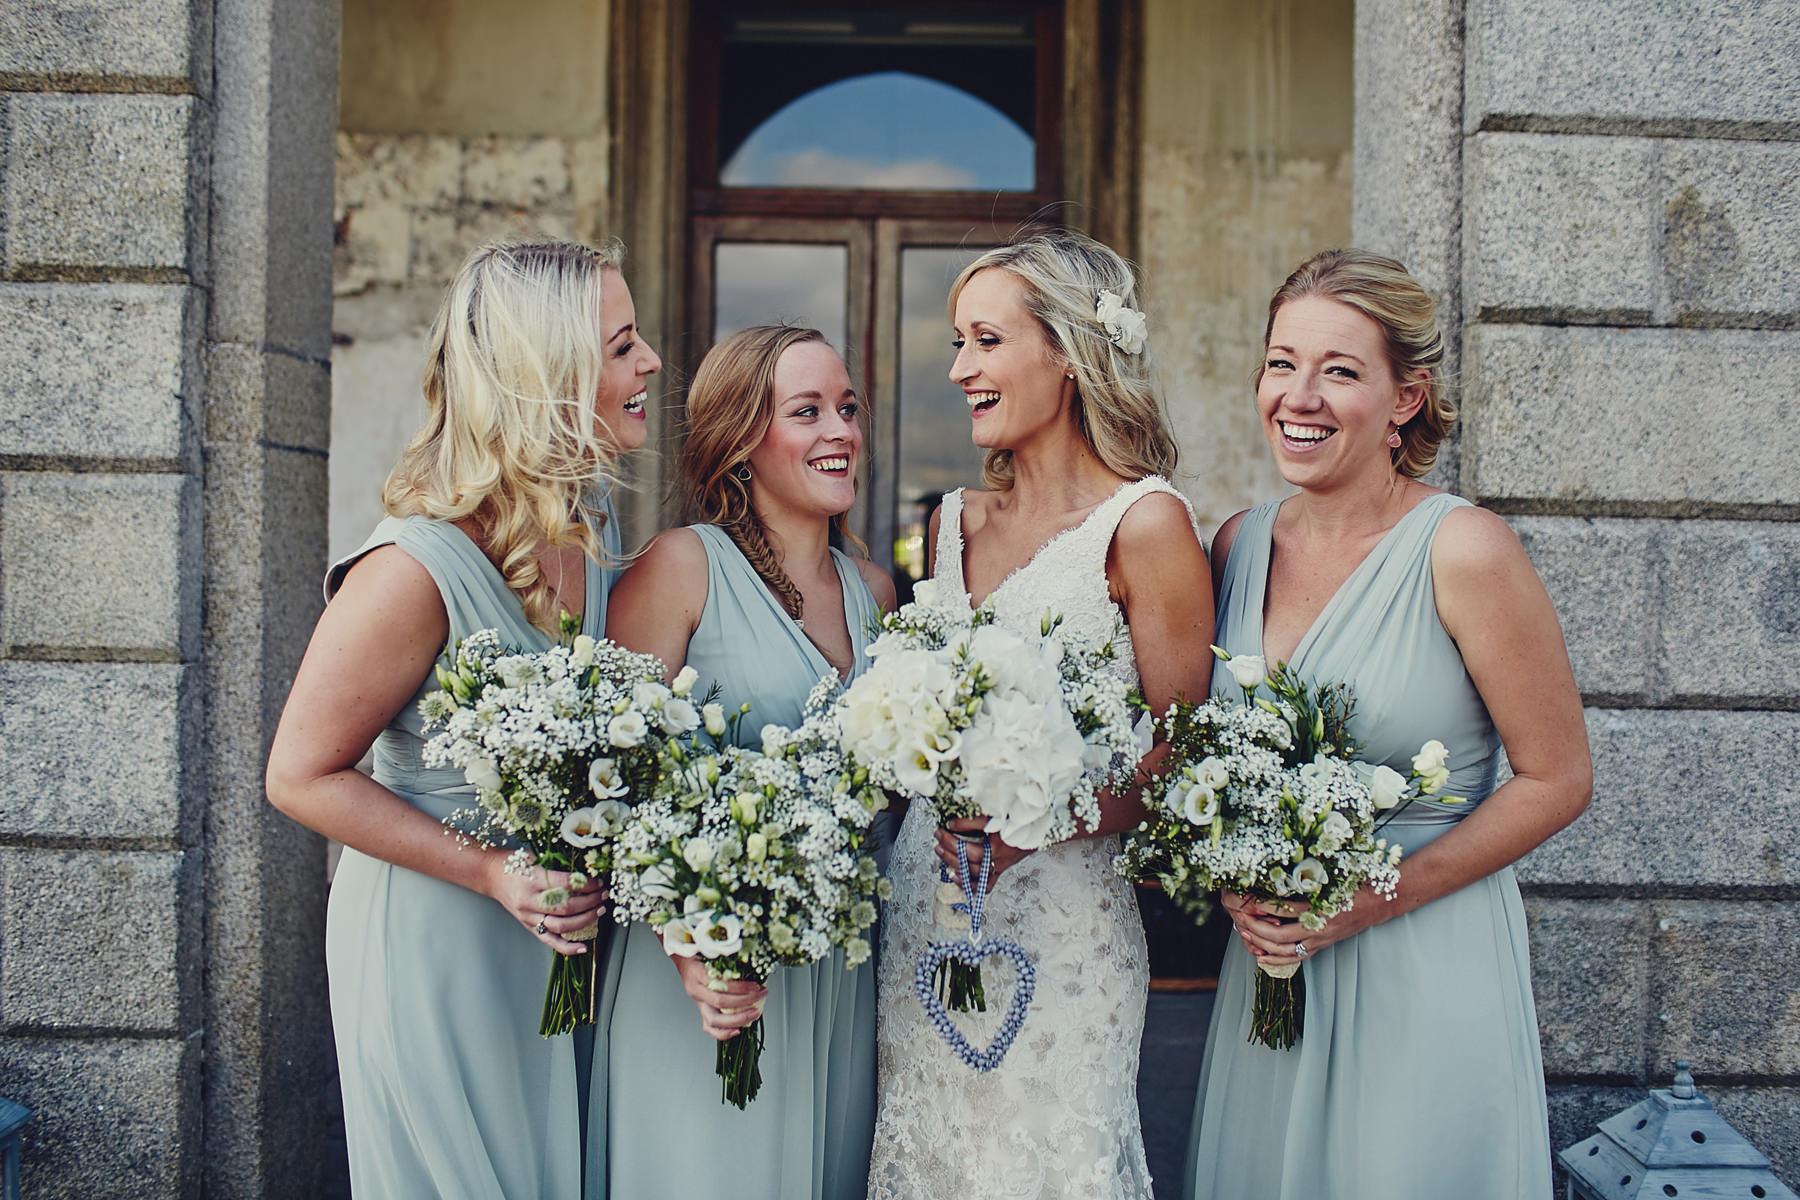 Wedding at Borris House co.Carlow 044 - Borris House wedding | Cara & David